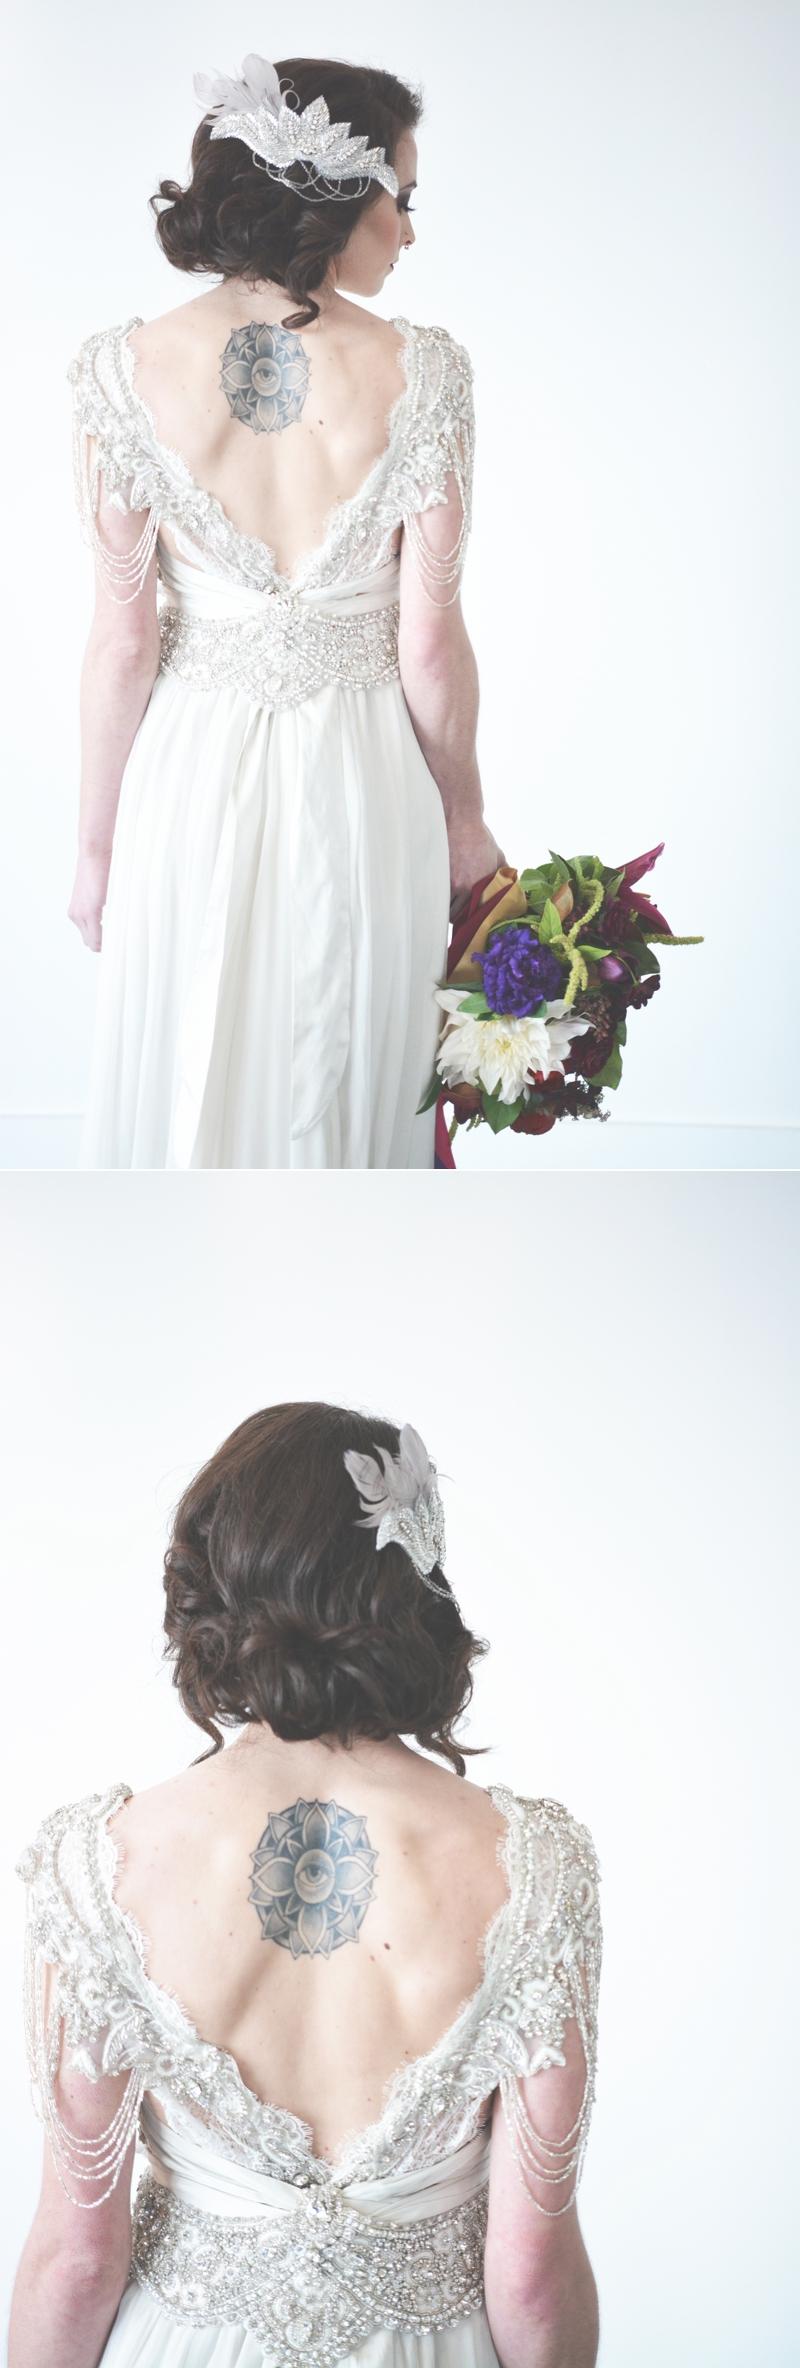 Ventanas Wedding Inspiration Collaboration - Six Hearts Photography28